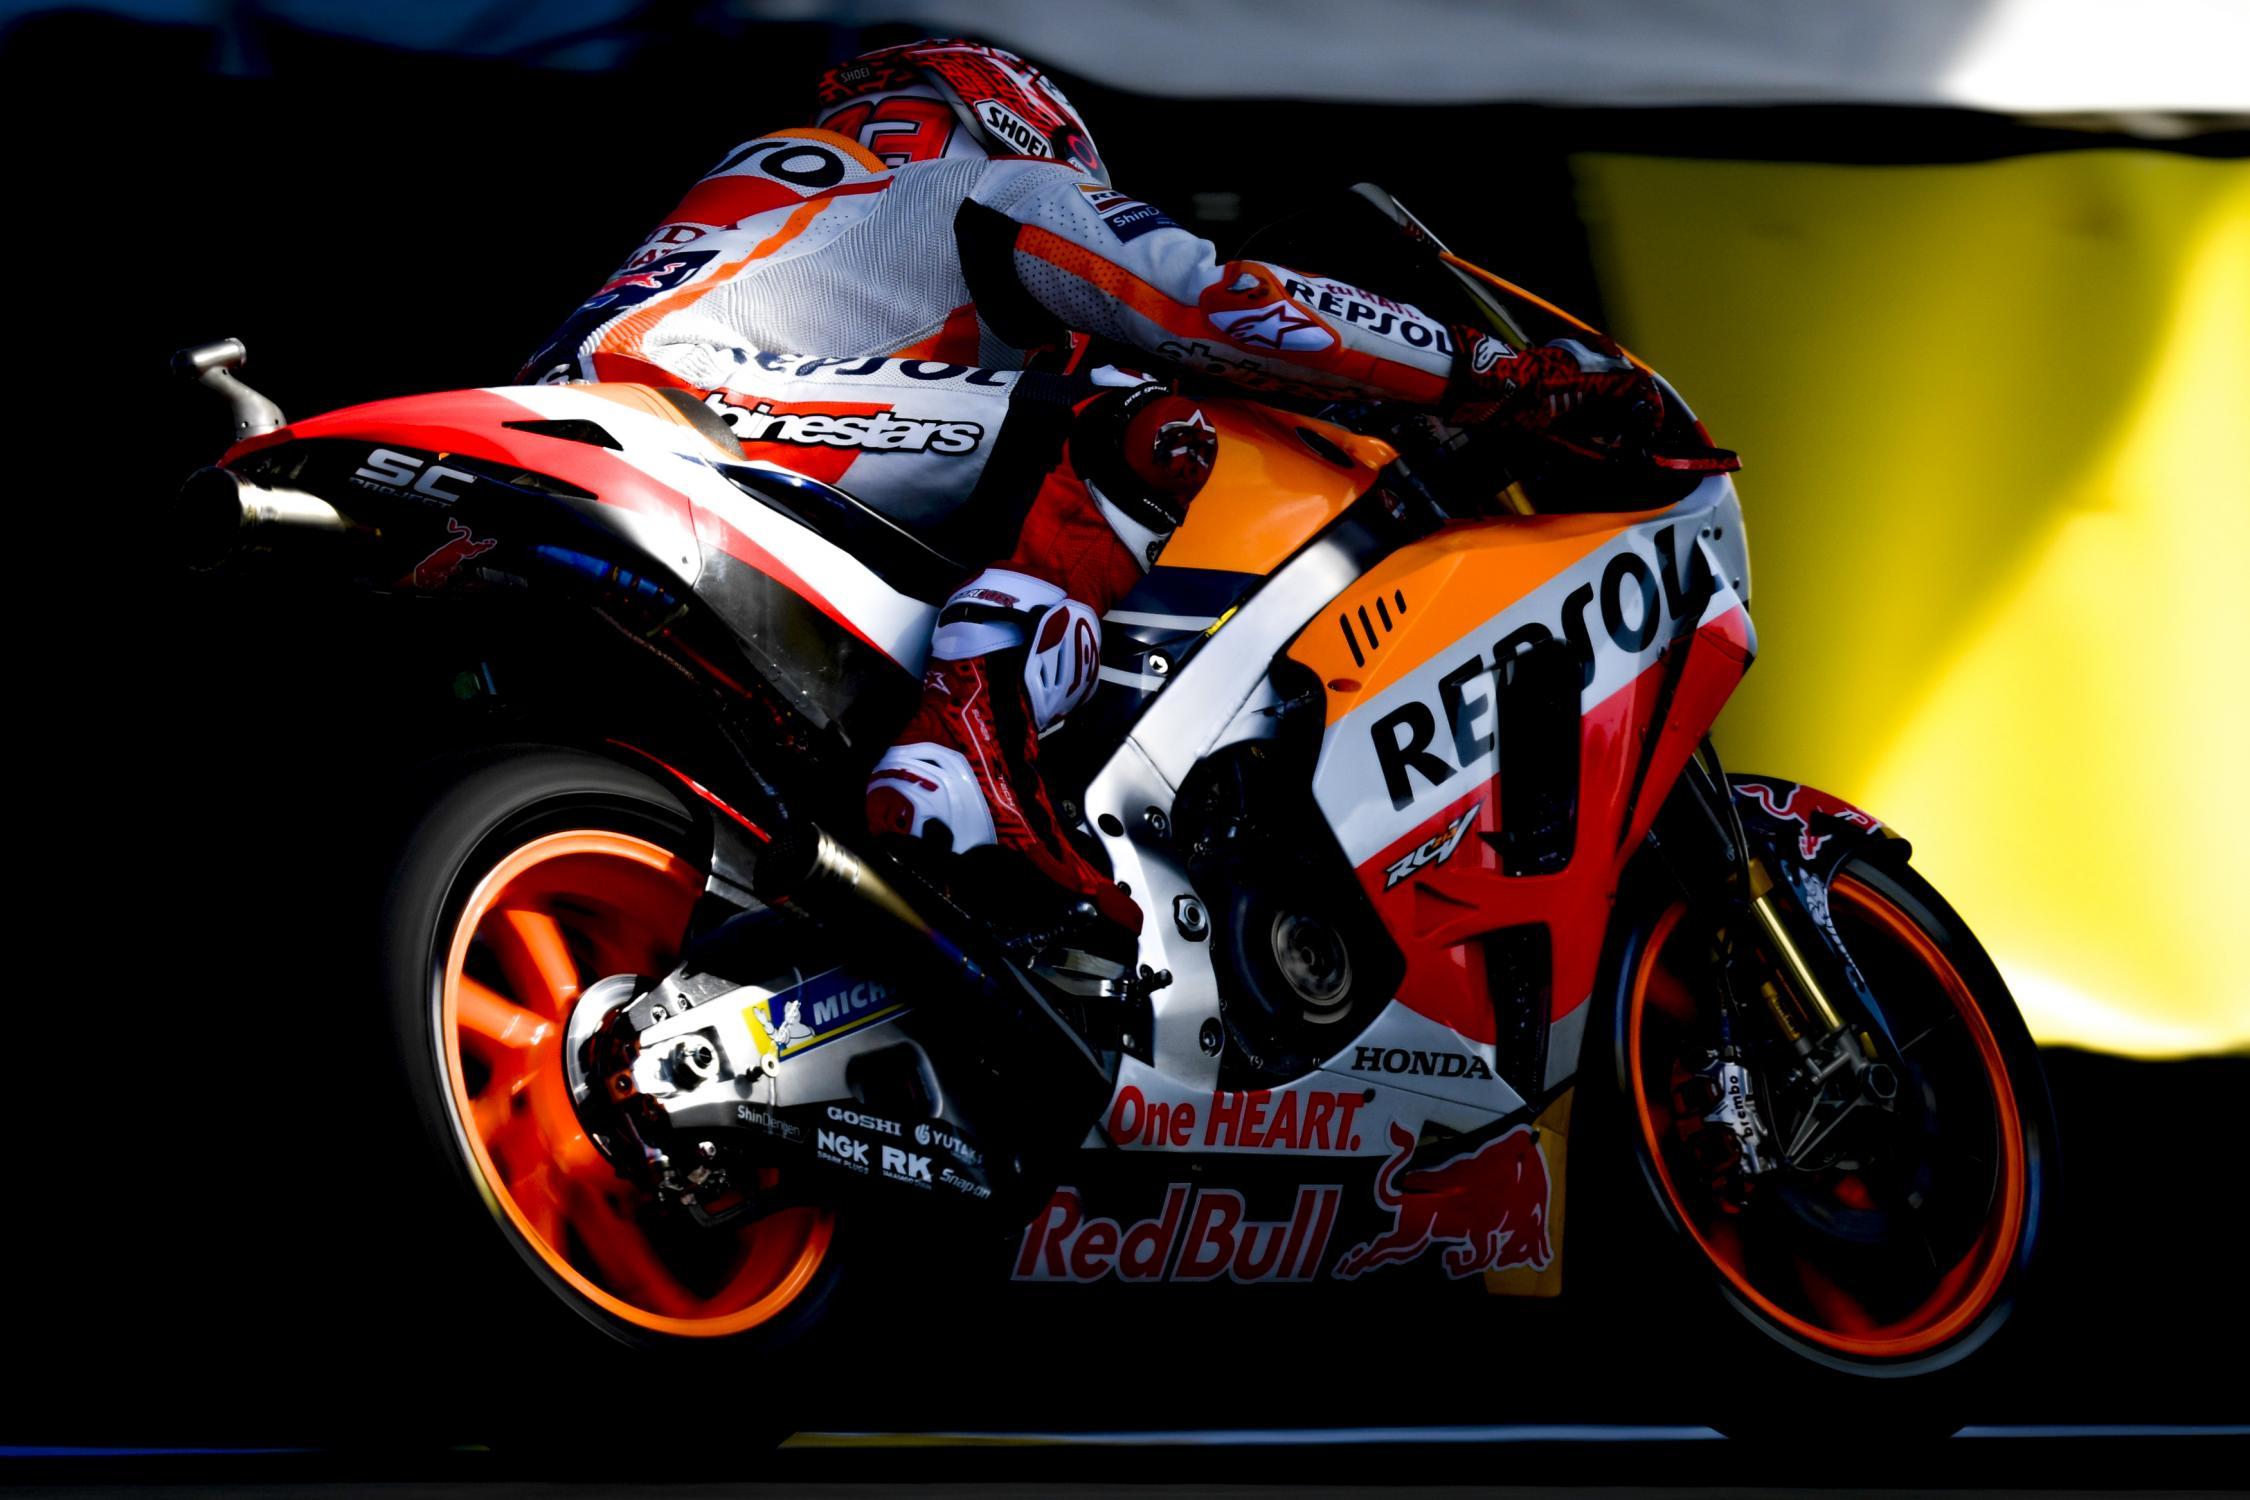 [GP] Le Mans _ds51711.gallery_full_top_fullscreen